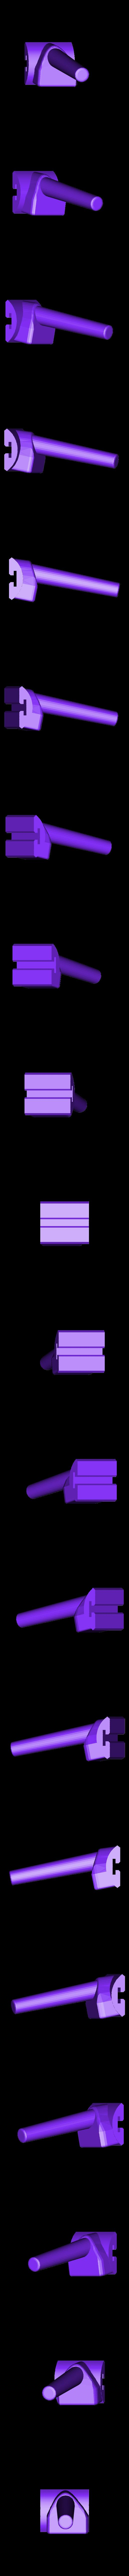 mini_T-34_main-gun.stl Download STL file Mini T-34 • 3D printer model, c47